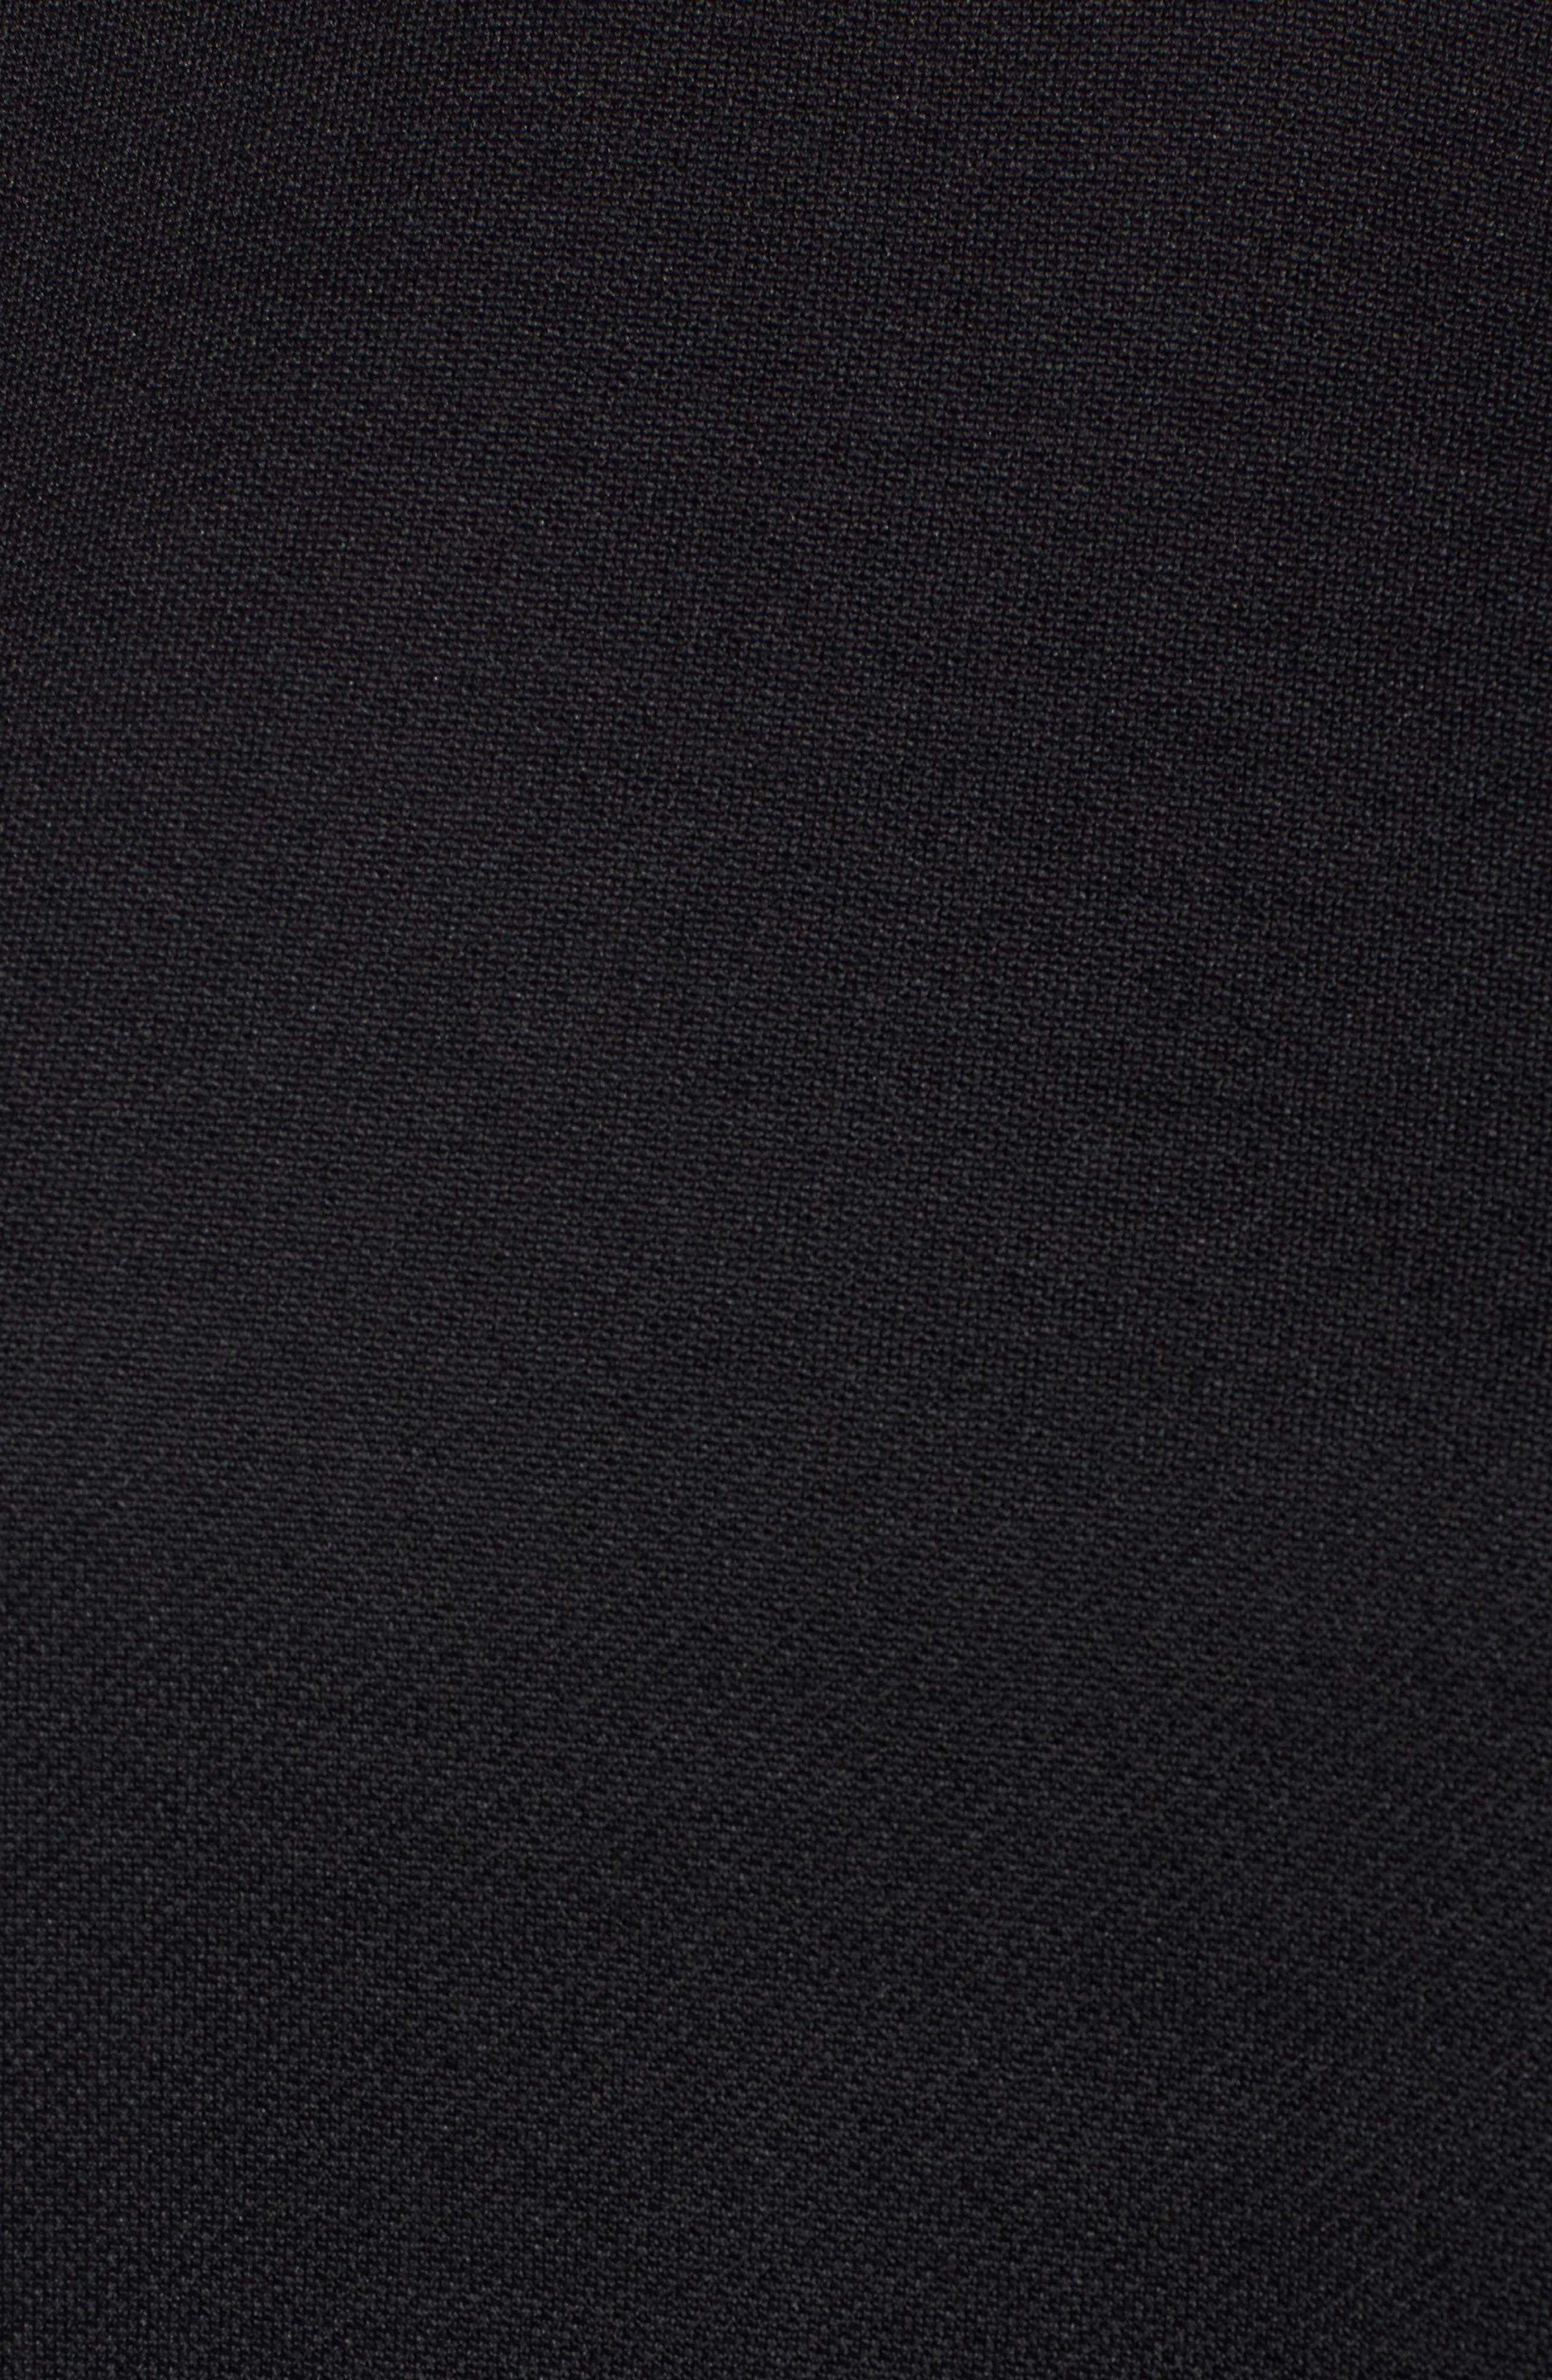 Shrunken Fleece Sweatshirt,                             Alternate thumbnail 5, color,                             027